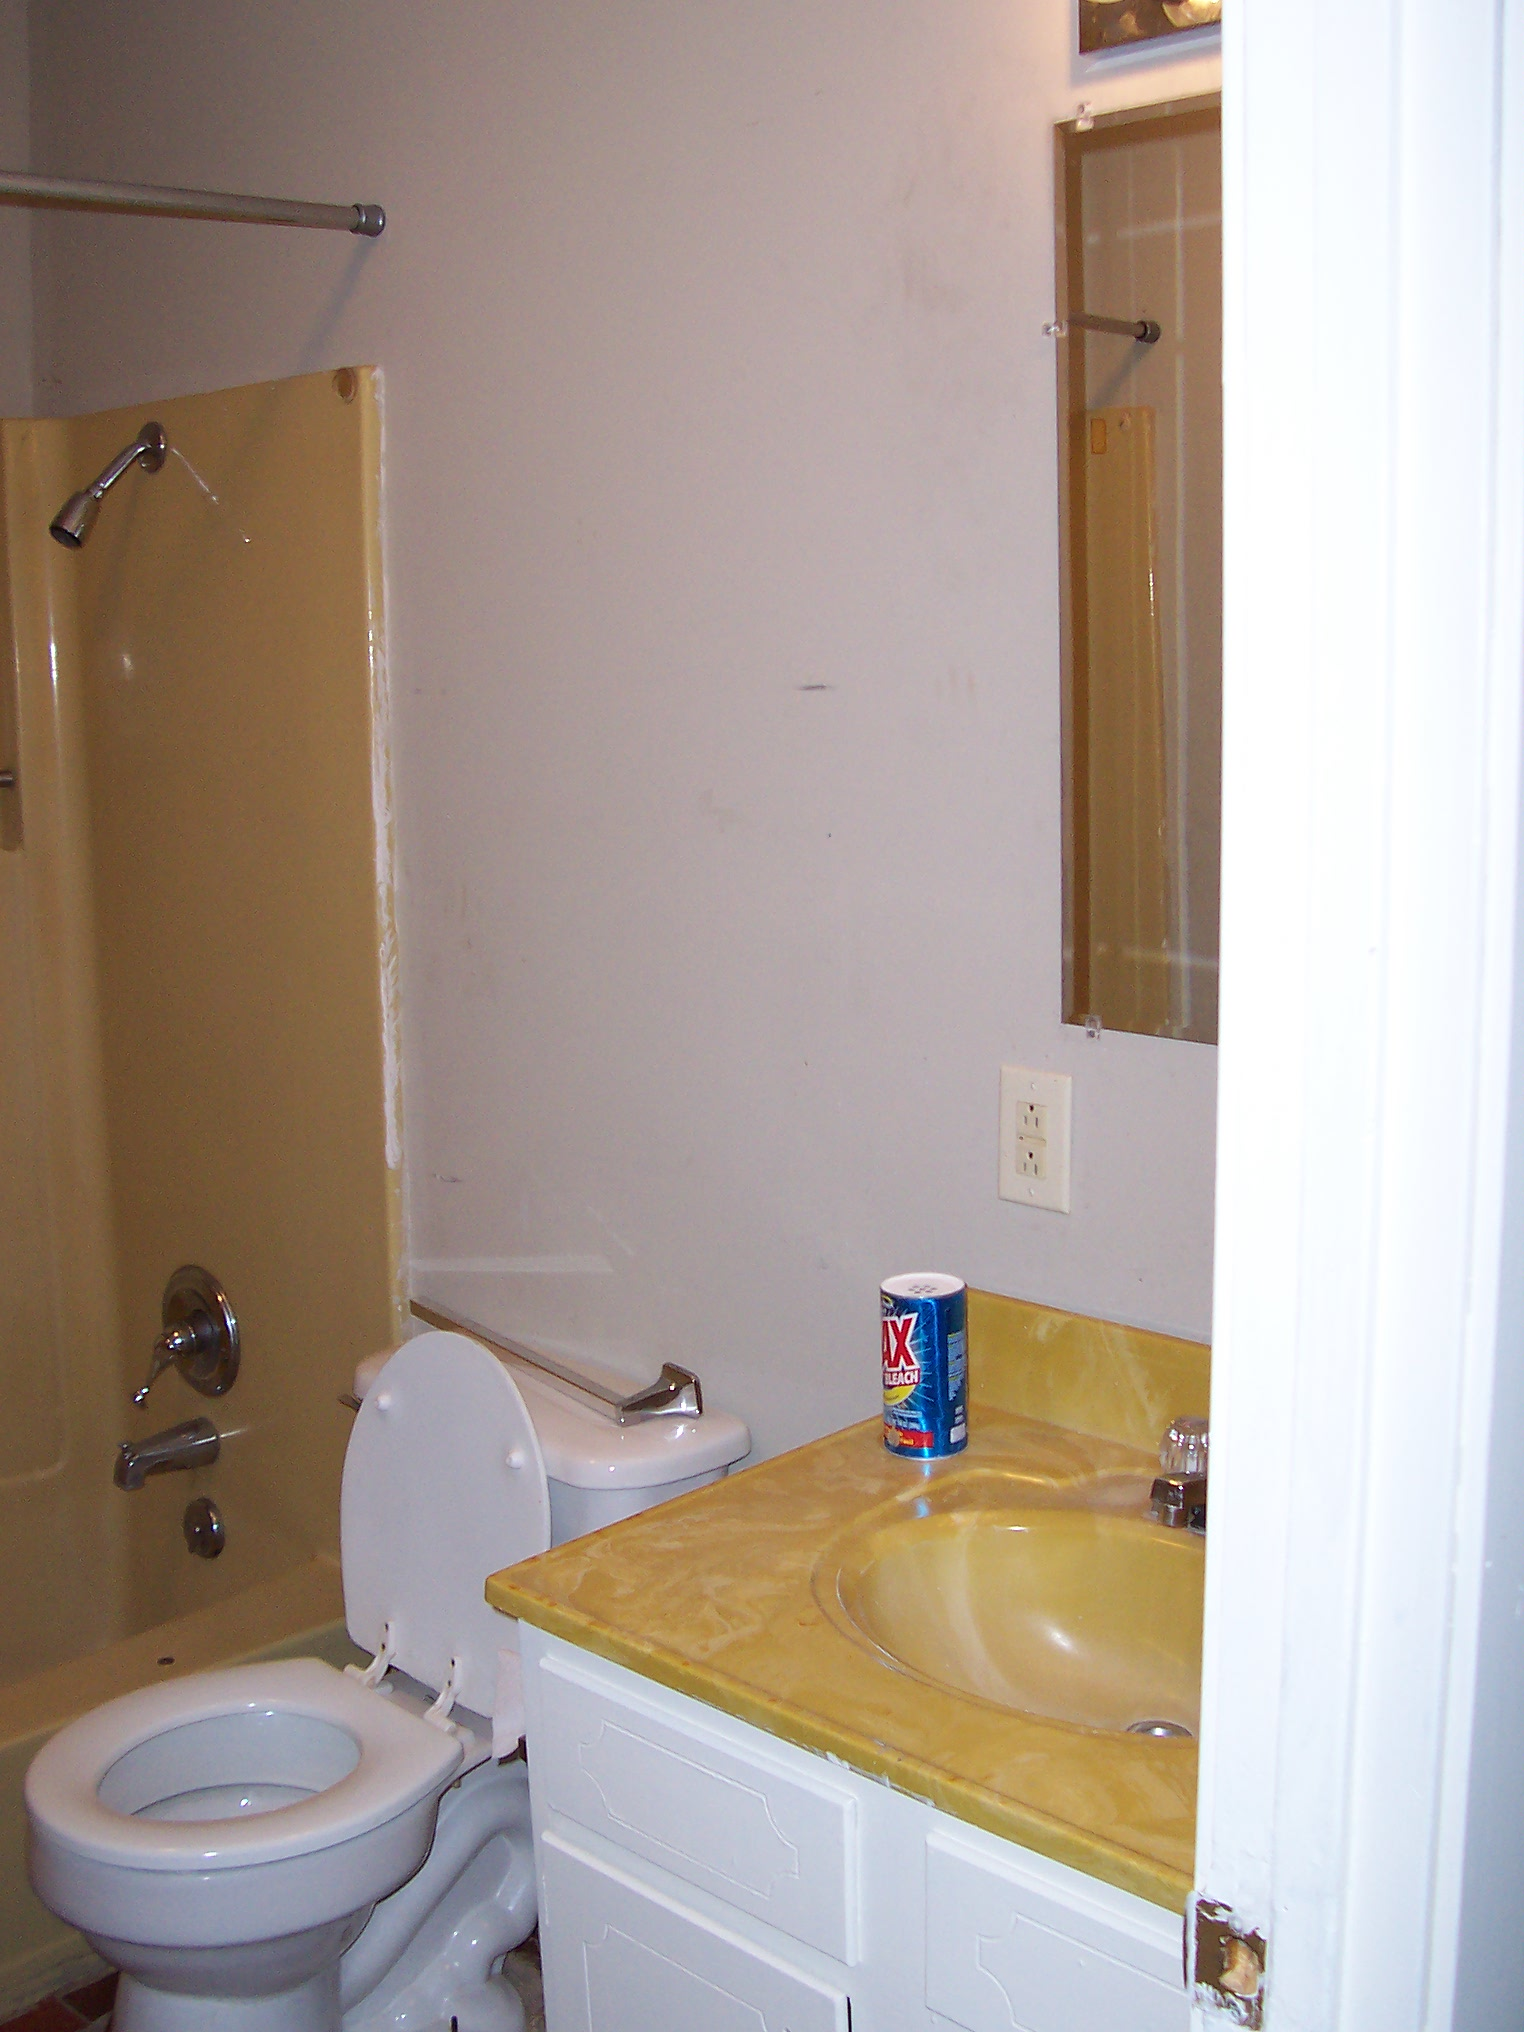 harvest gold toilet seat. Blog  256 Gold Fixtures Bathroom Color Buzz Finish